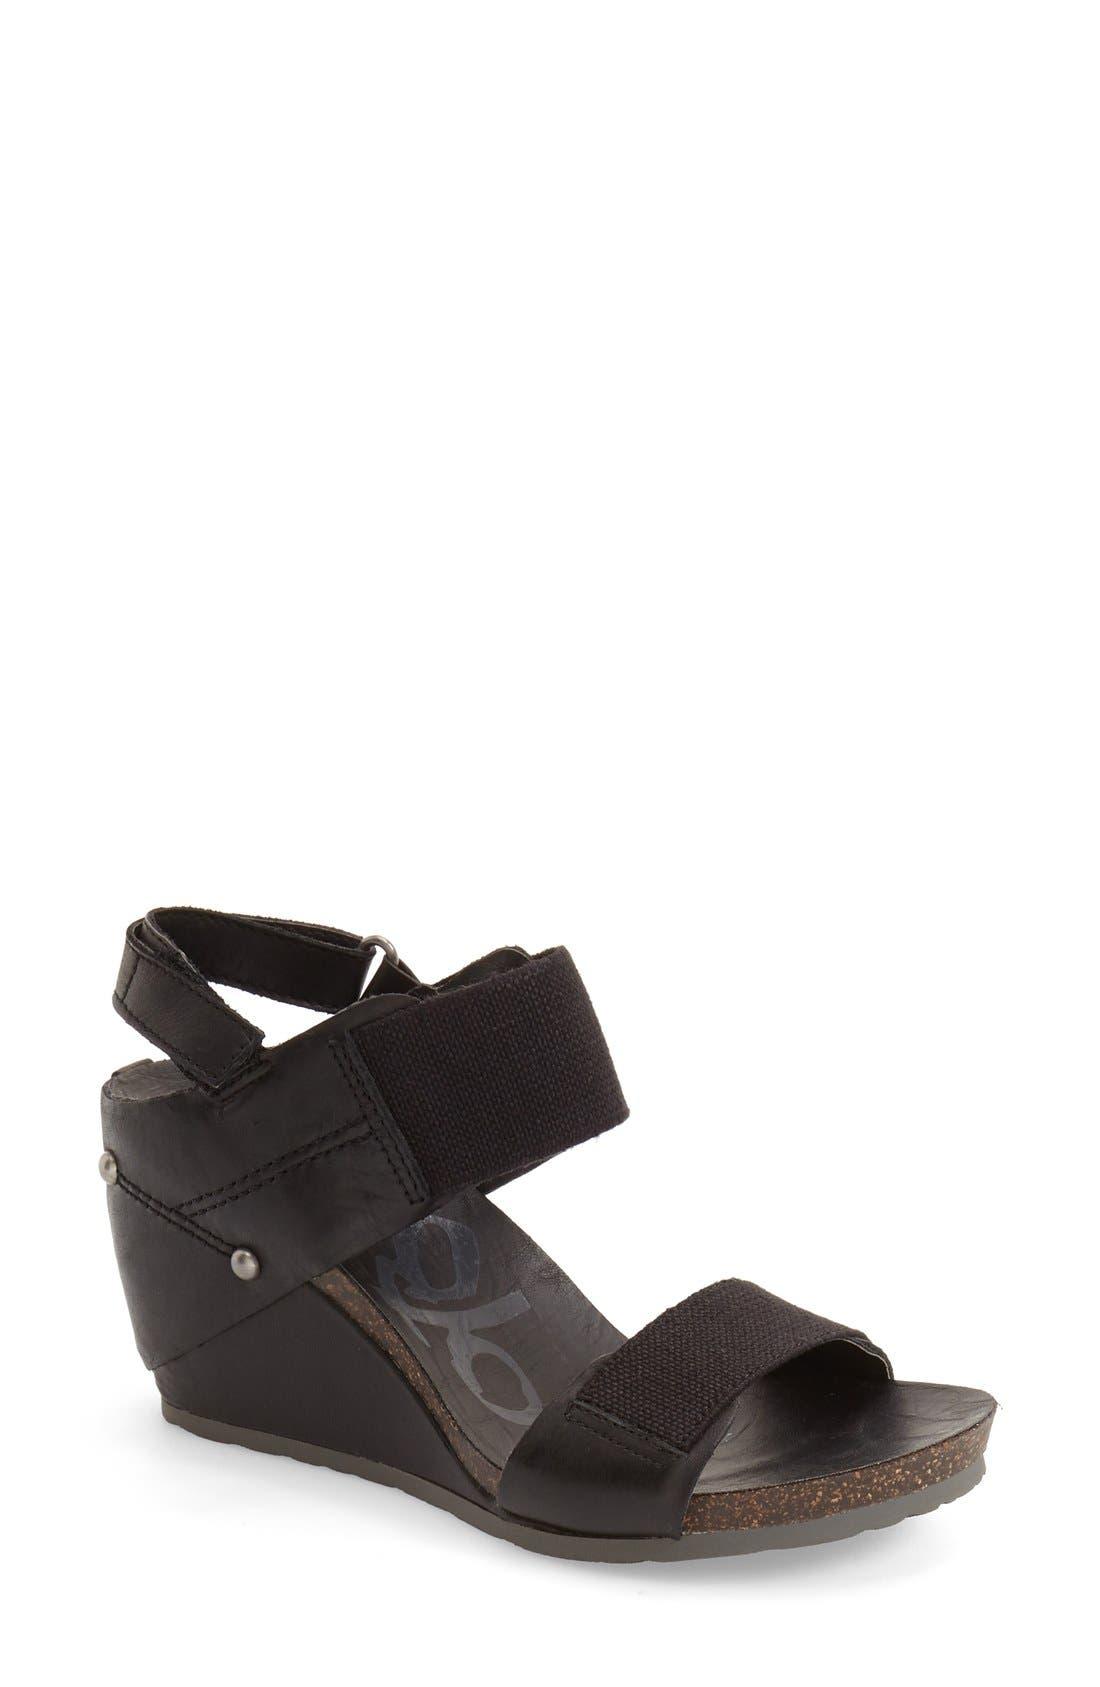 'Trailblazer' Wedge Sandal,                             Main thumbnail 1, color,                             Black Leather